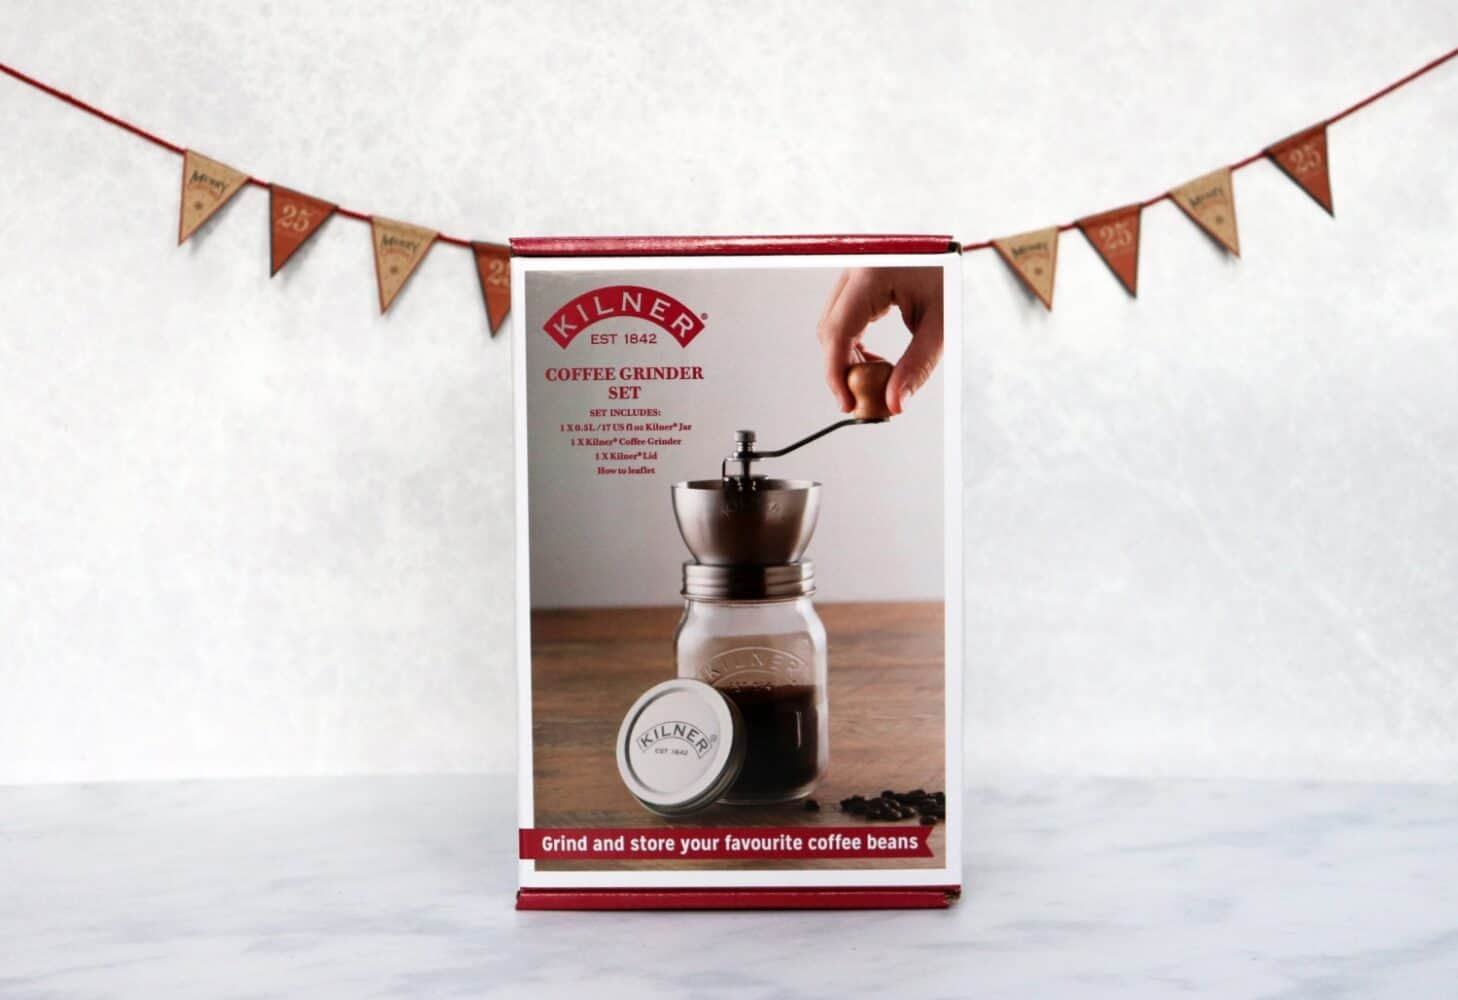 Kilner Coffee Grinder Set